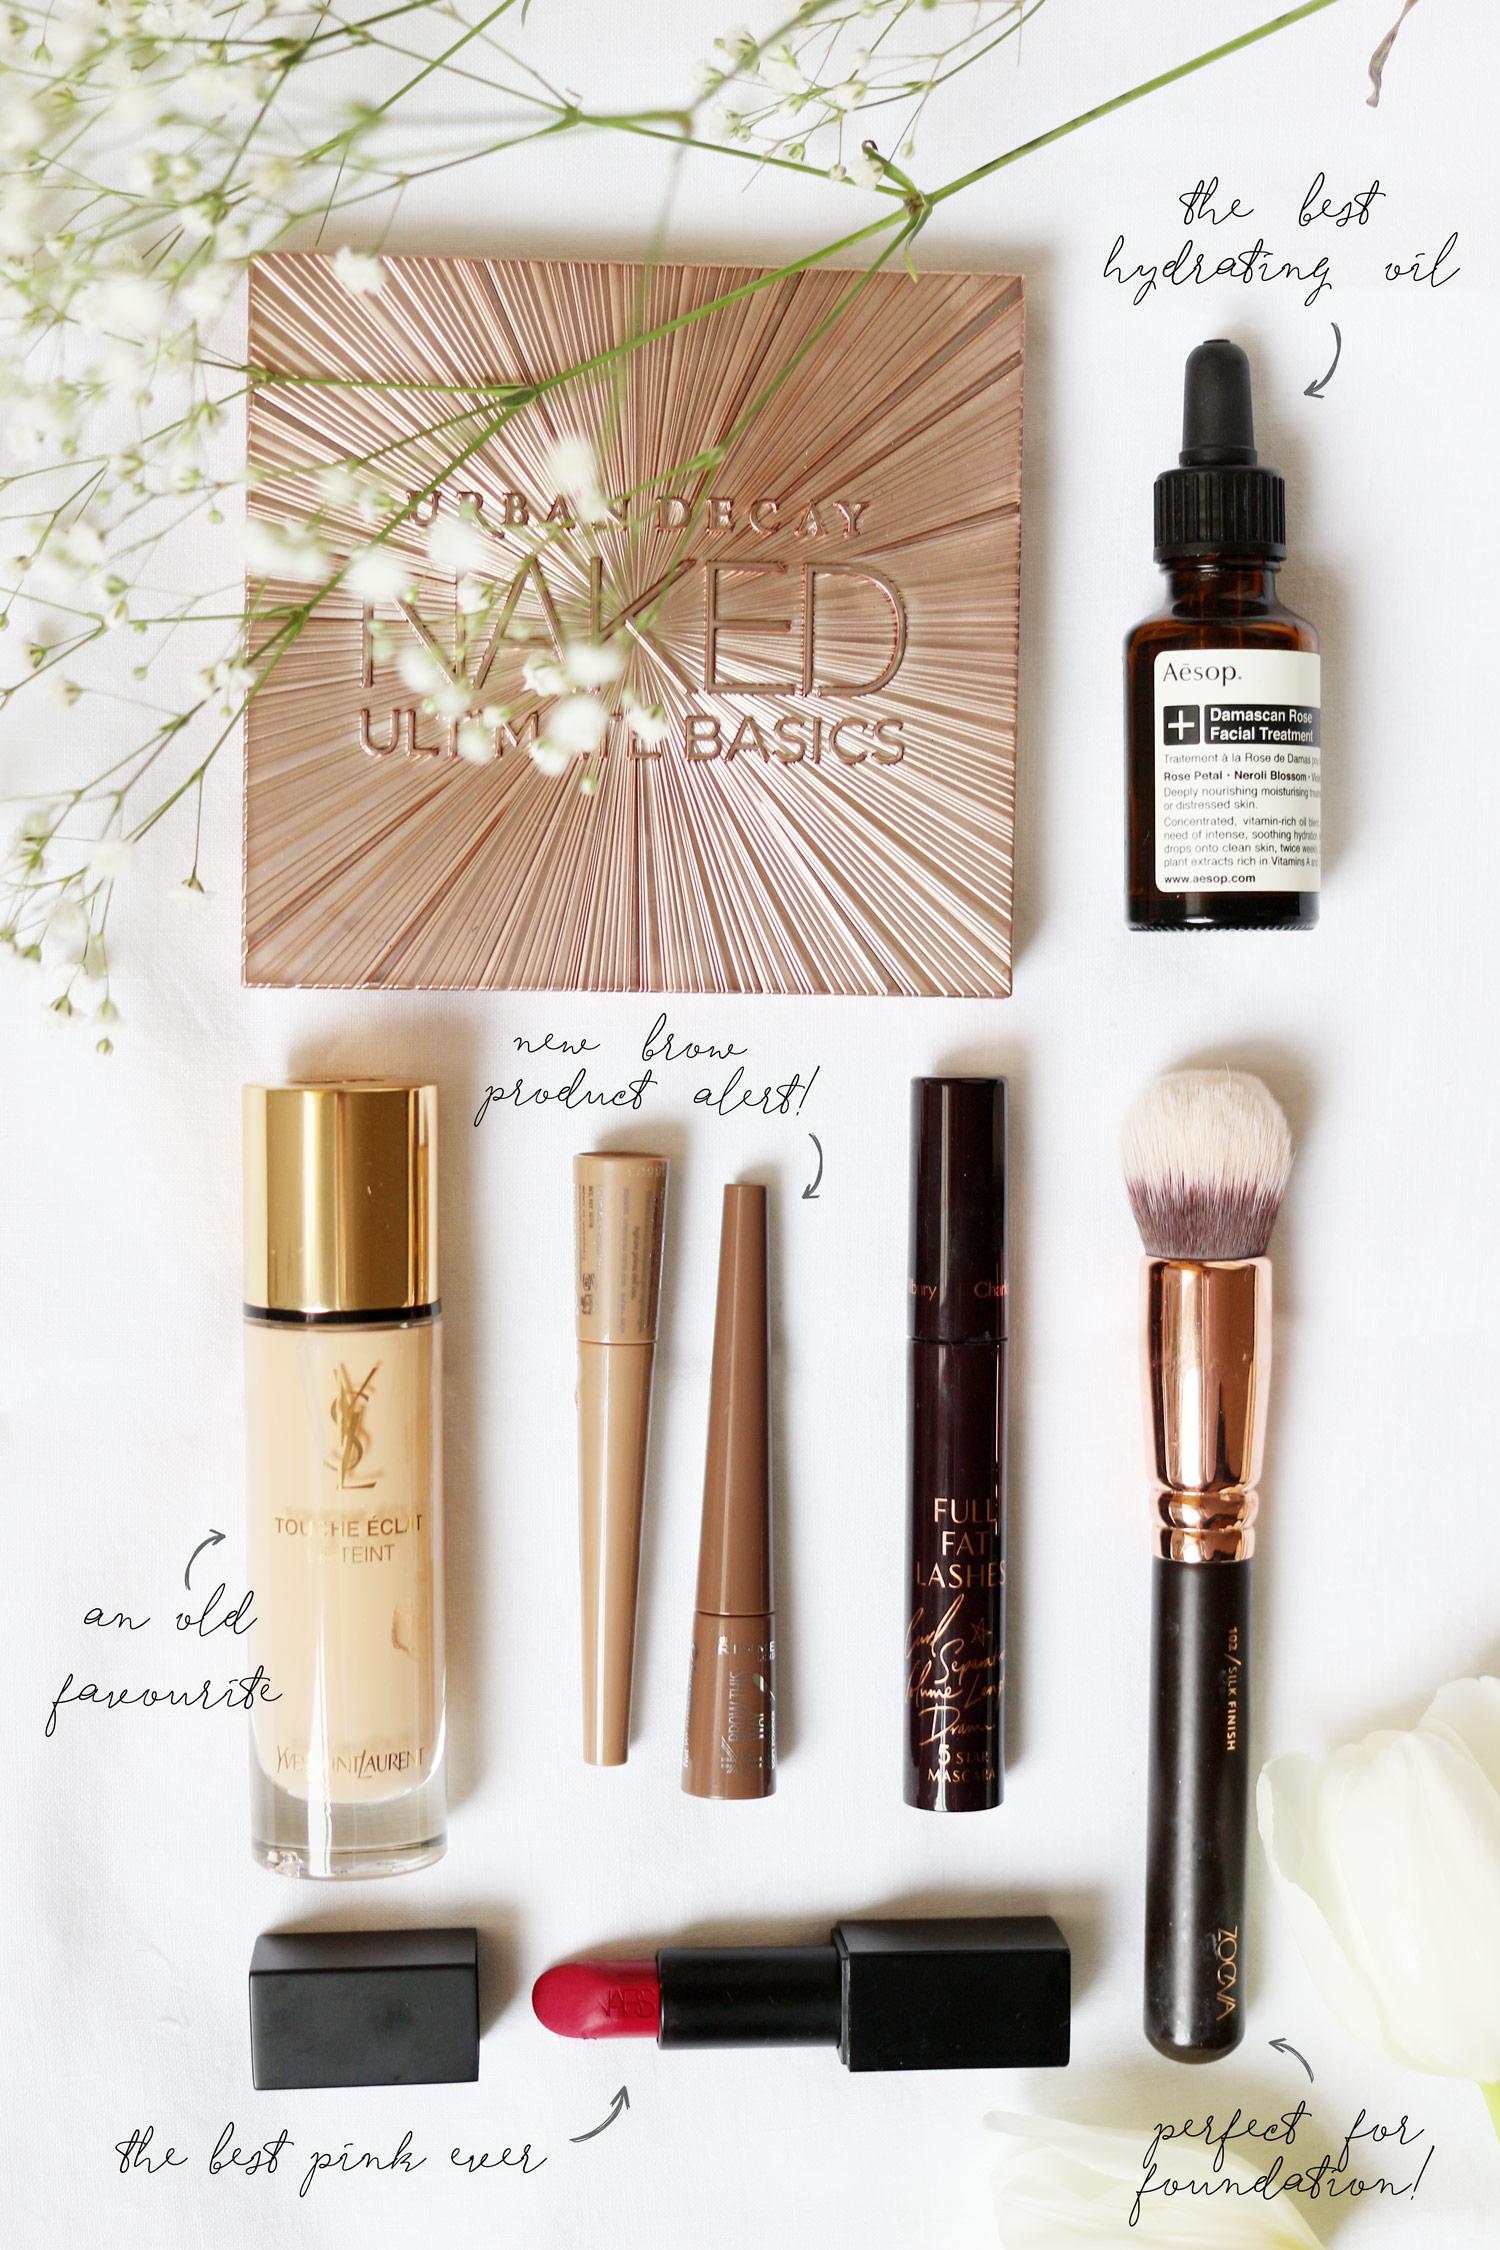 makeup-favourites-ysl-touche-eclat-foundation-NARS-vera-UD-naked-basics